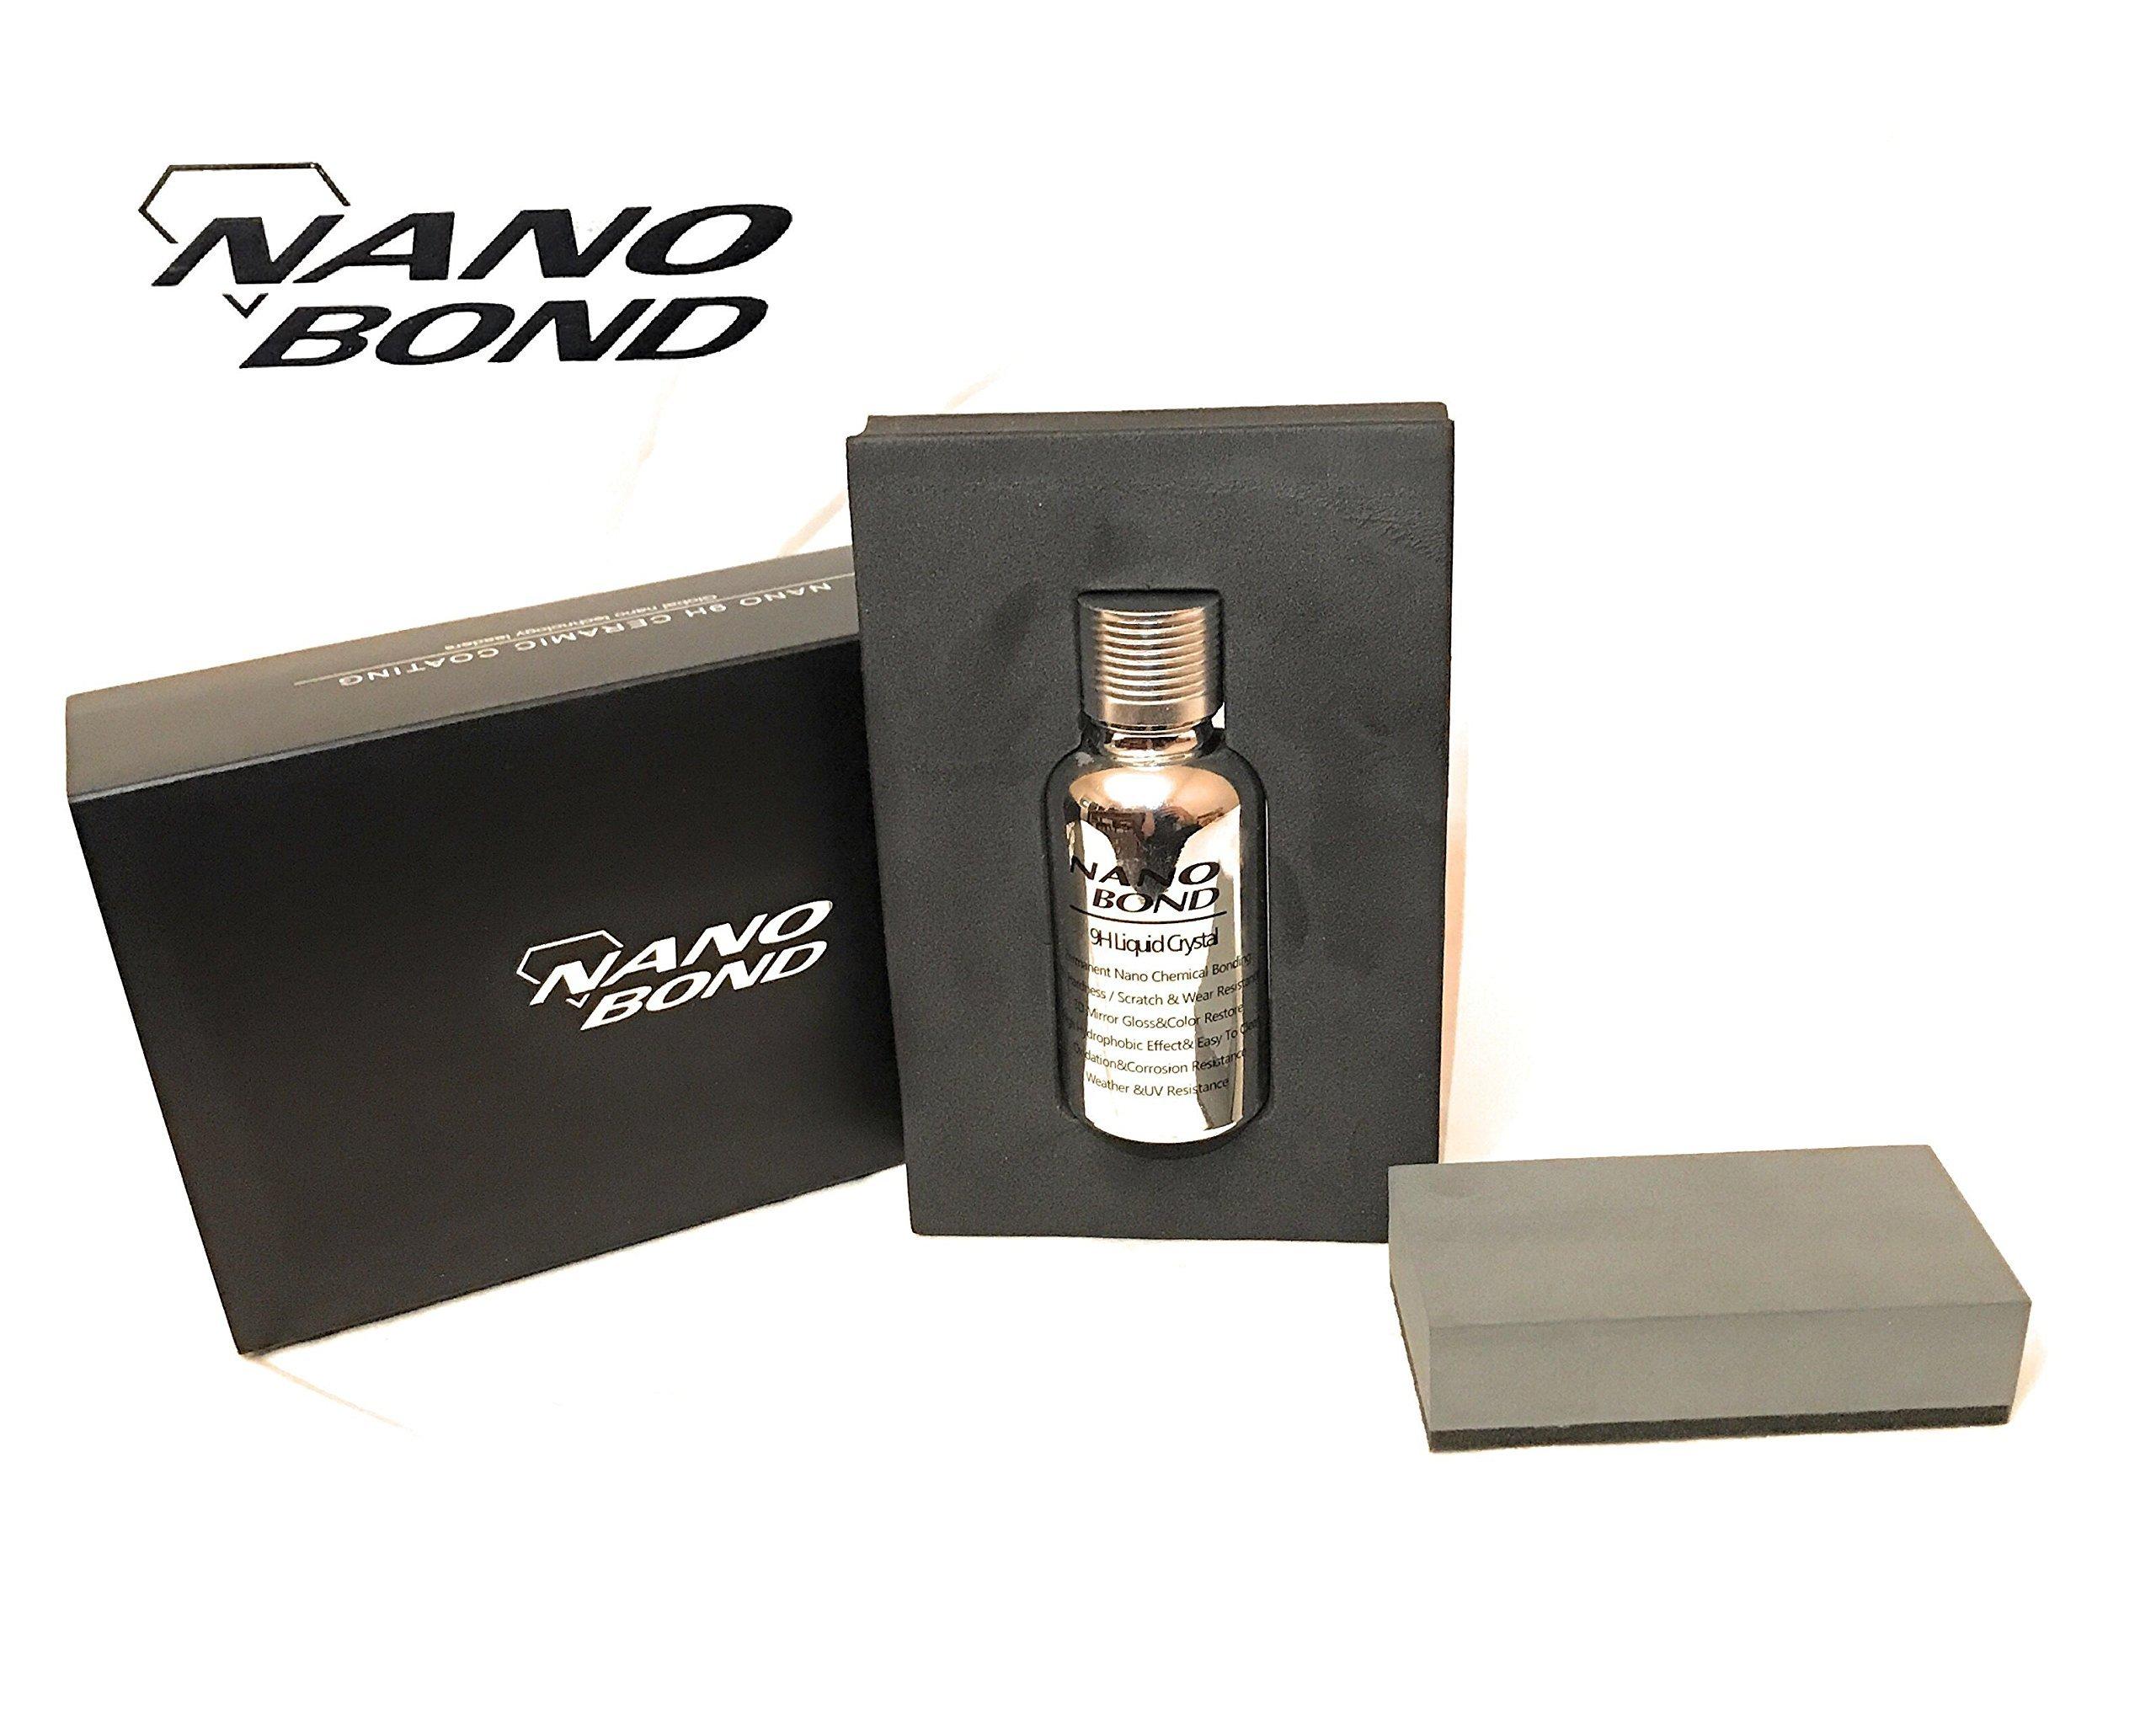 Nano Bond Ceramic Coating Car Care Kit 9H High Gloss Paint Protection 30ML